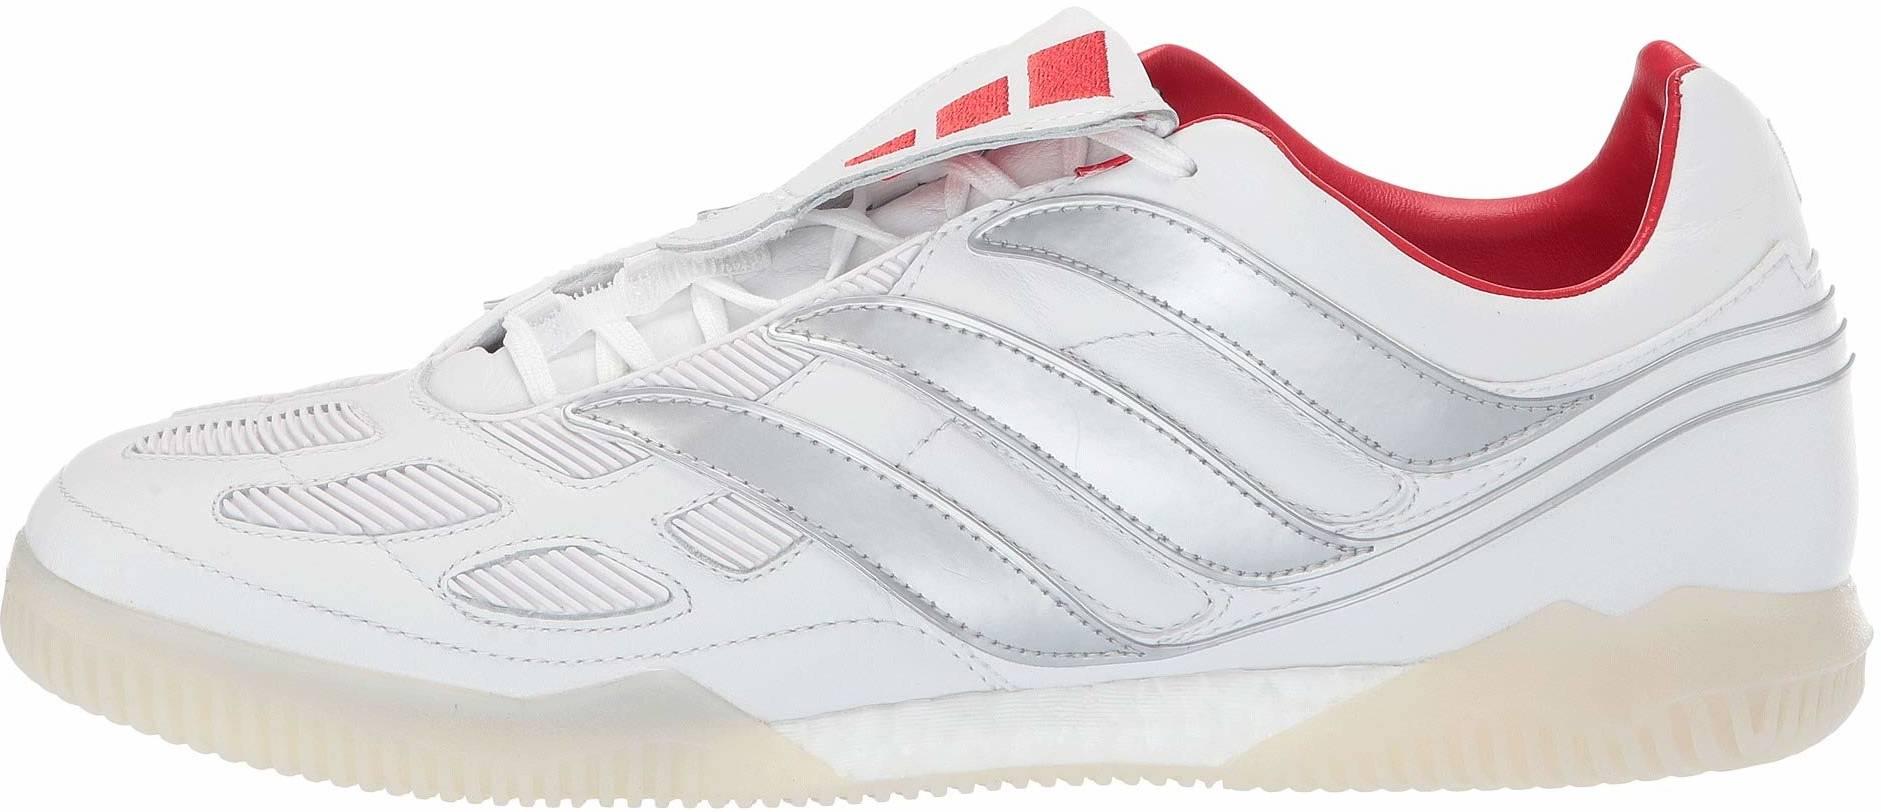 candidato Álbum de graduación Hollywood  8 Reasons to/NOT to Buy Adidas Predator Precision David Beckham Shoes (Jan  2021) | RunRepeat